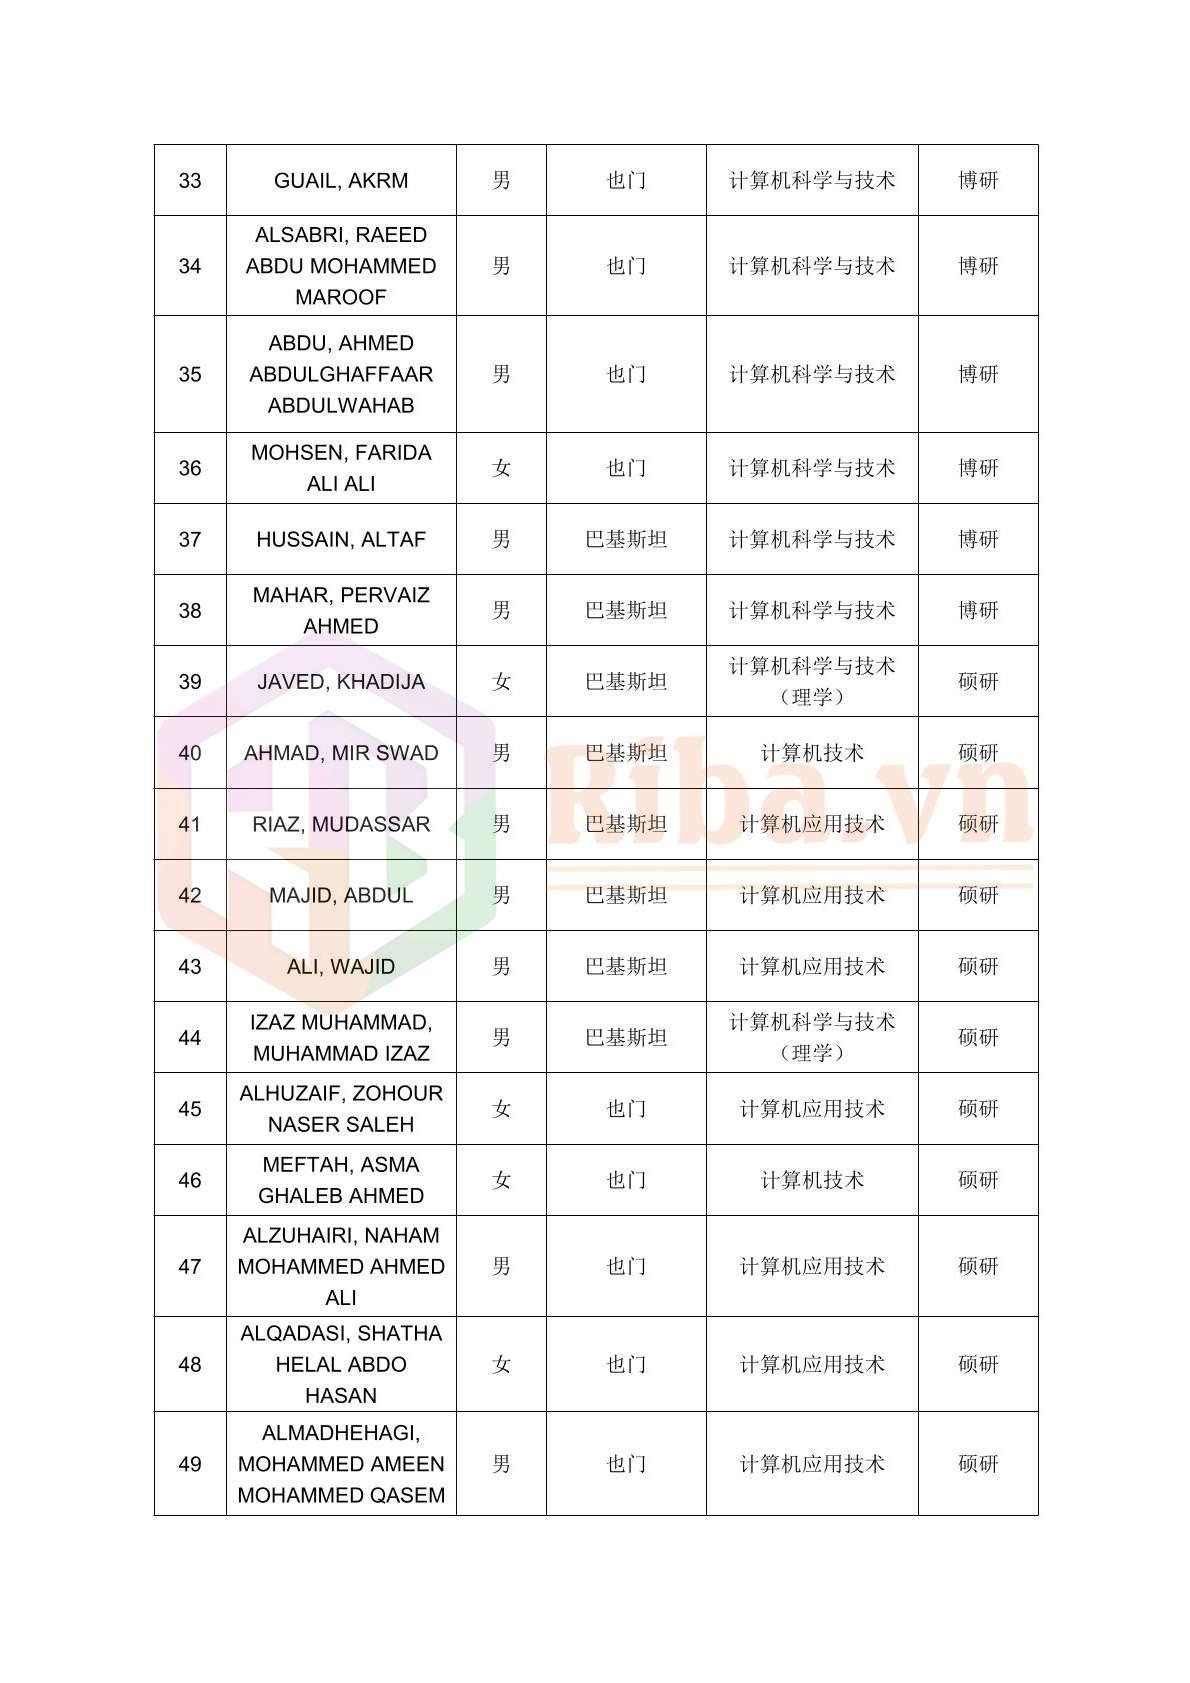 Danh Sach Do Hoc Bong Csc Dai Hoc Trung Nam 2020 03 2021